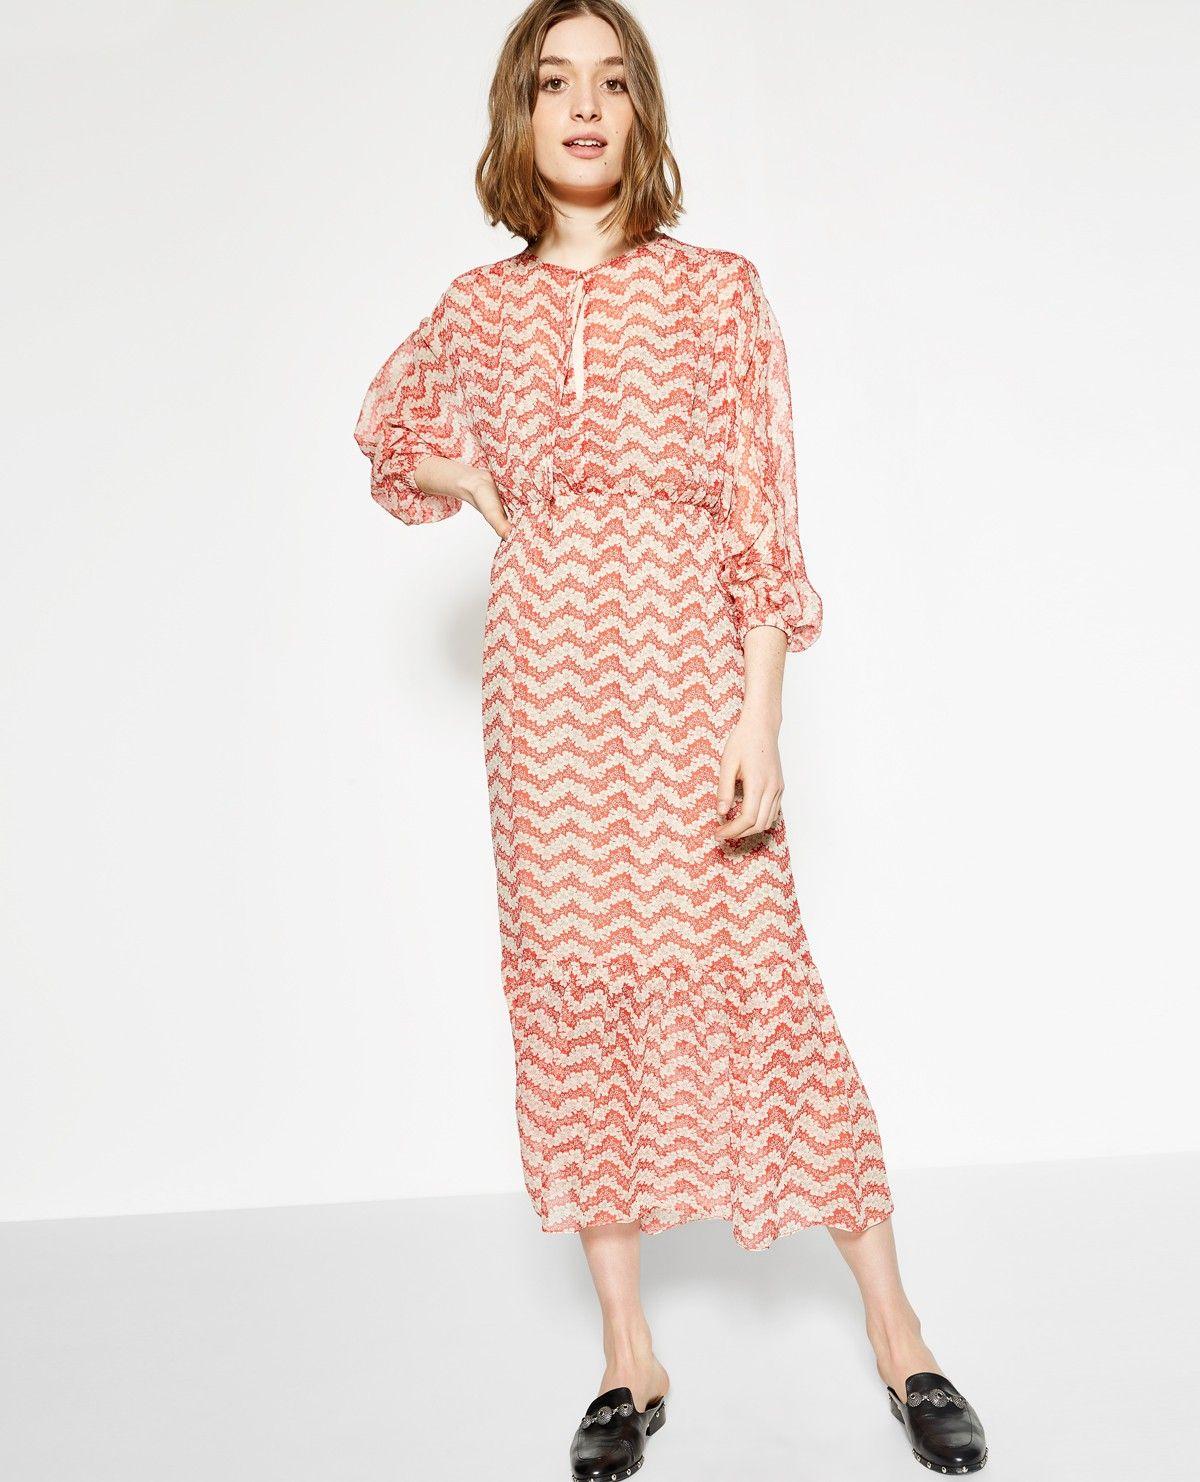 5b1c030a795 Long Red Jasmine print silk dress - THE KOOPLES WOMAN | My Style ...